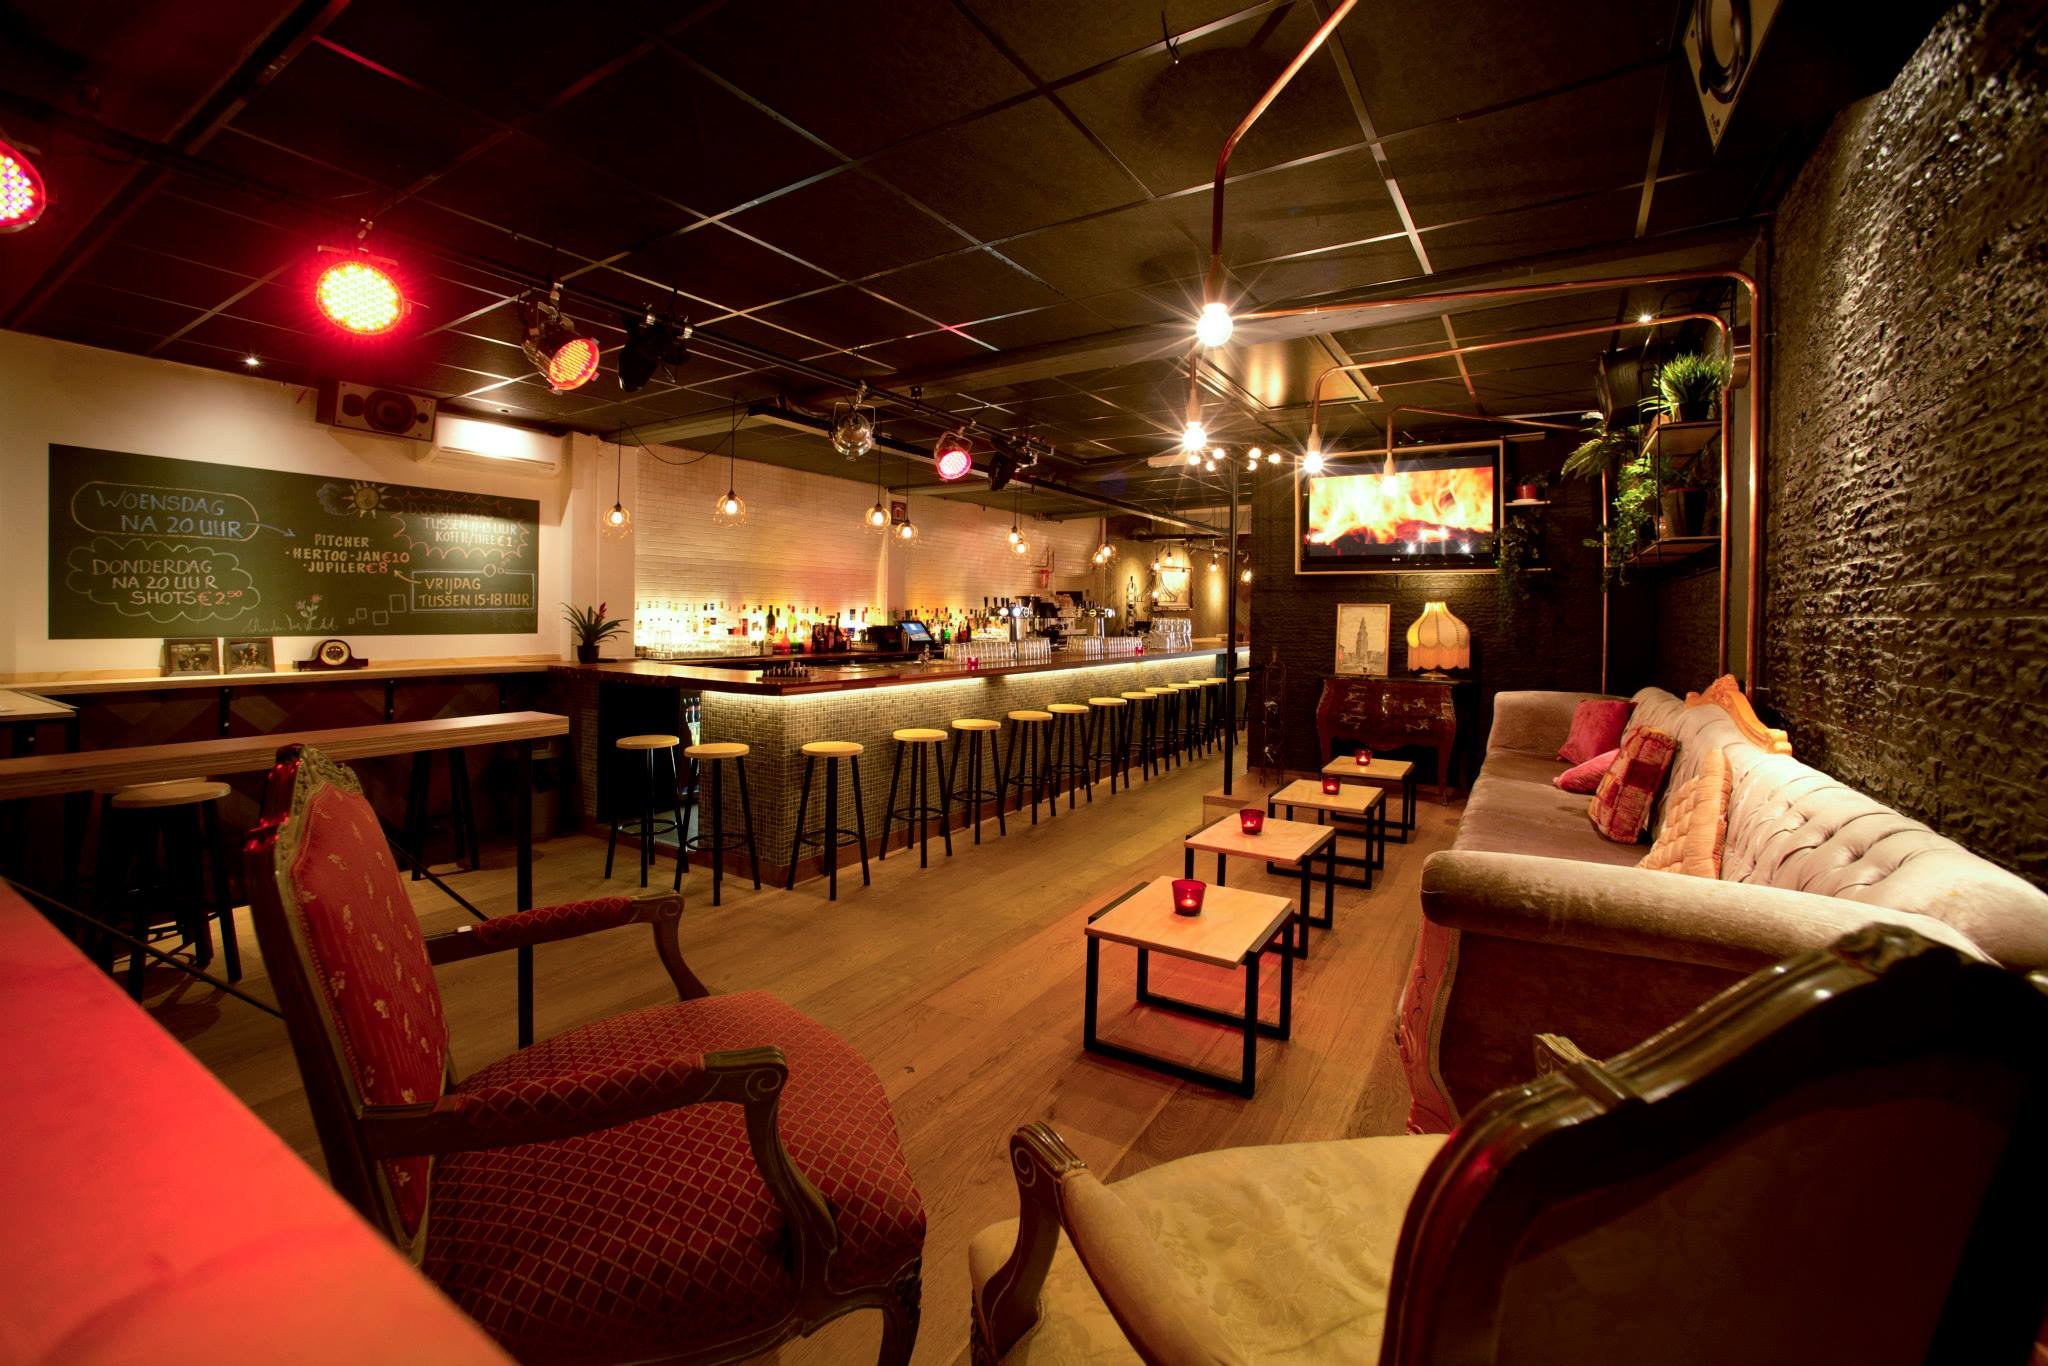 Zutphen Cafe Pico